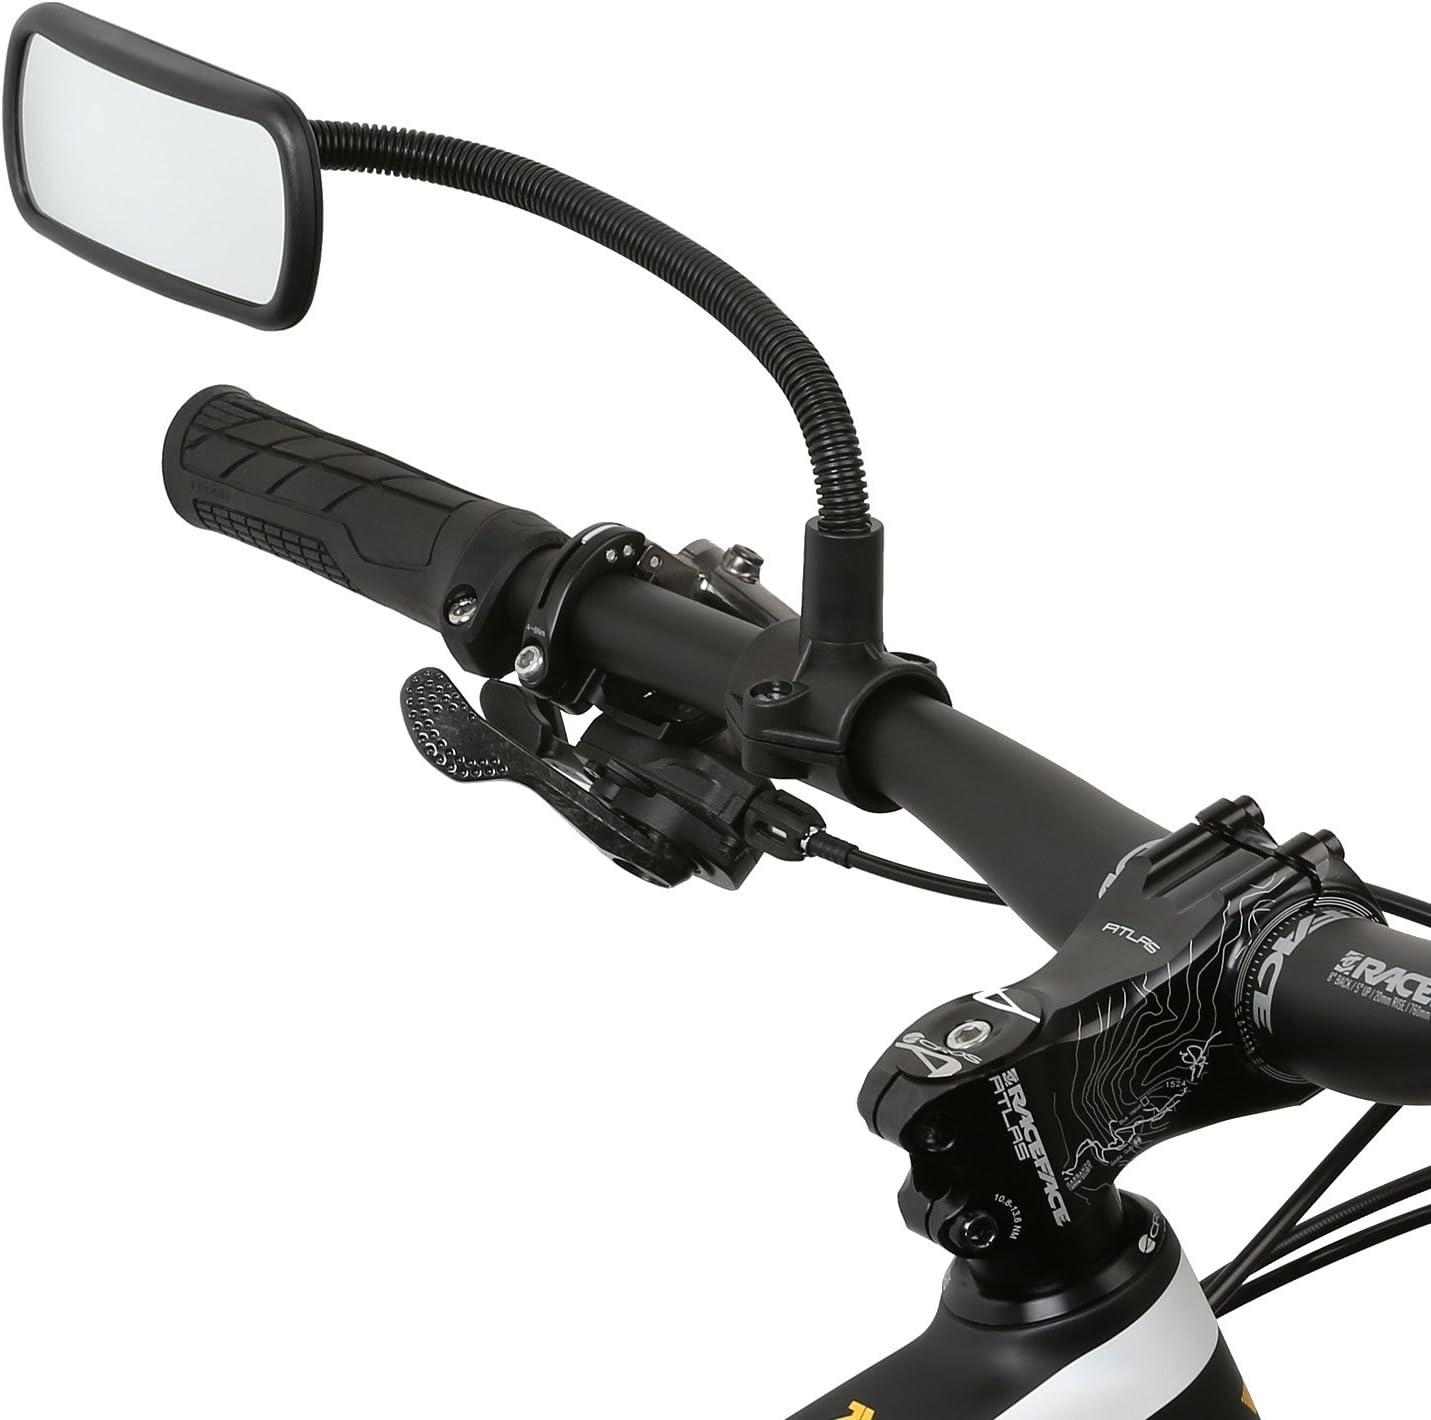 Wicked Chili–Espejo retrovisor para bicicleta, e-bike, monopatín, silla de ruedas, andador, cochecito, carro de golf, con cuello de cisne (Tamaño del Espejo: 104x 42mm, tubo de montaje, fabricado